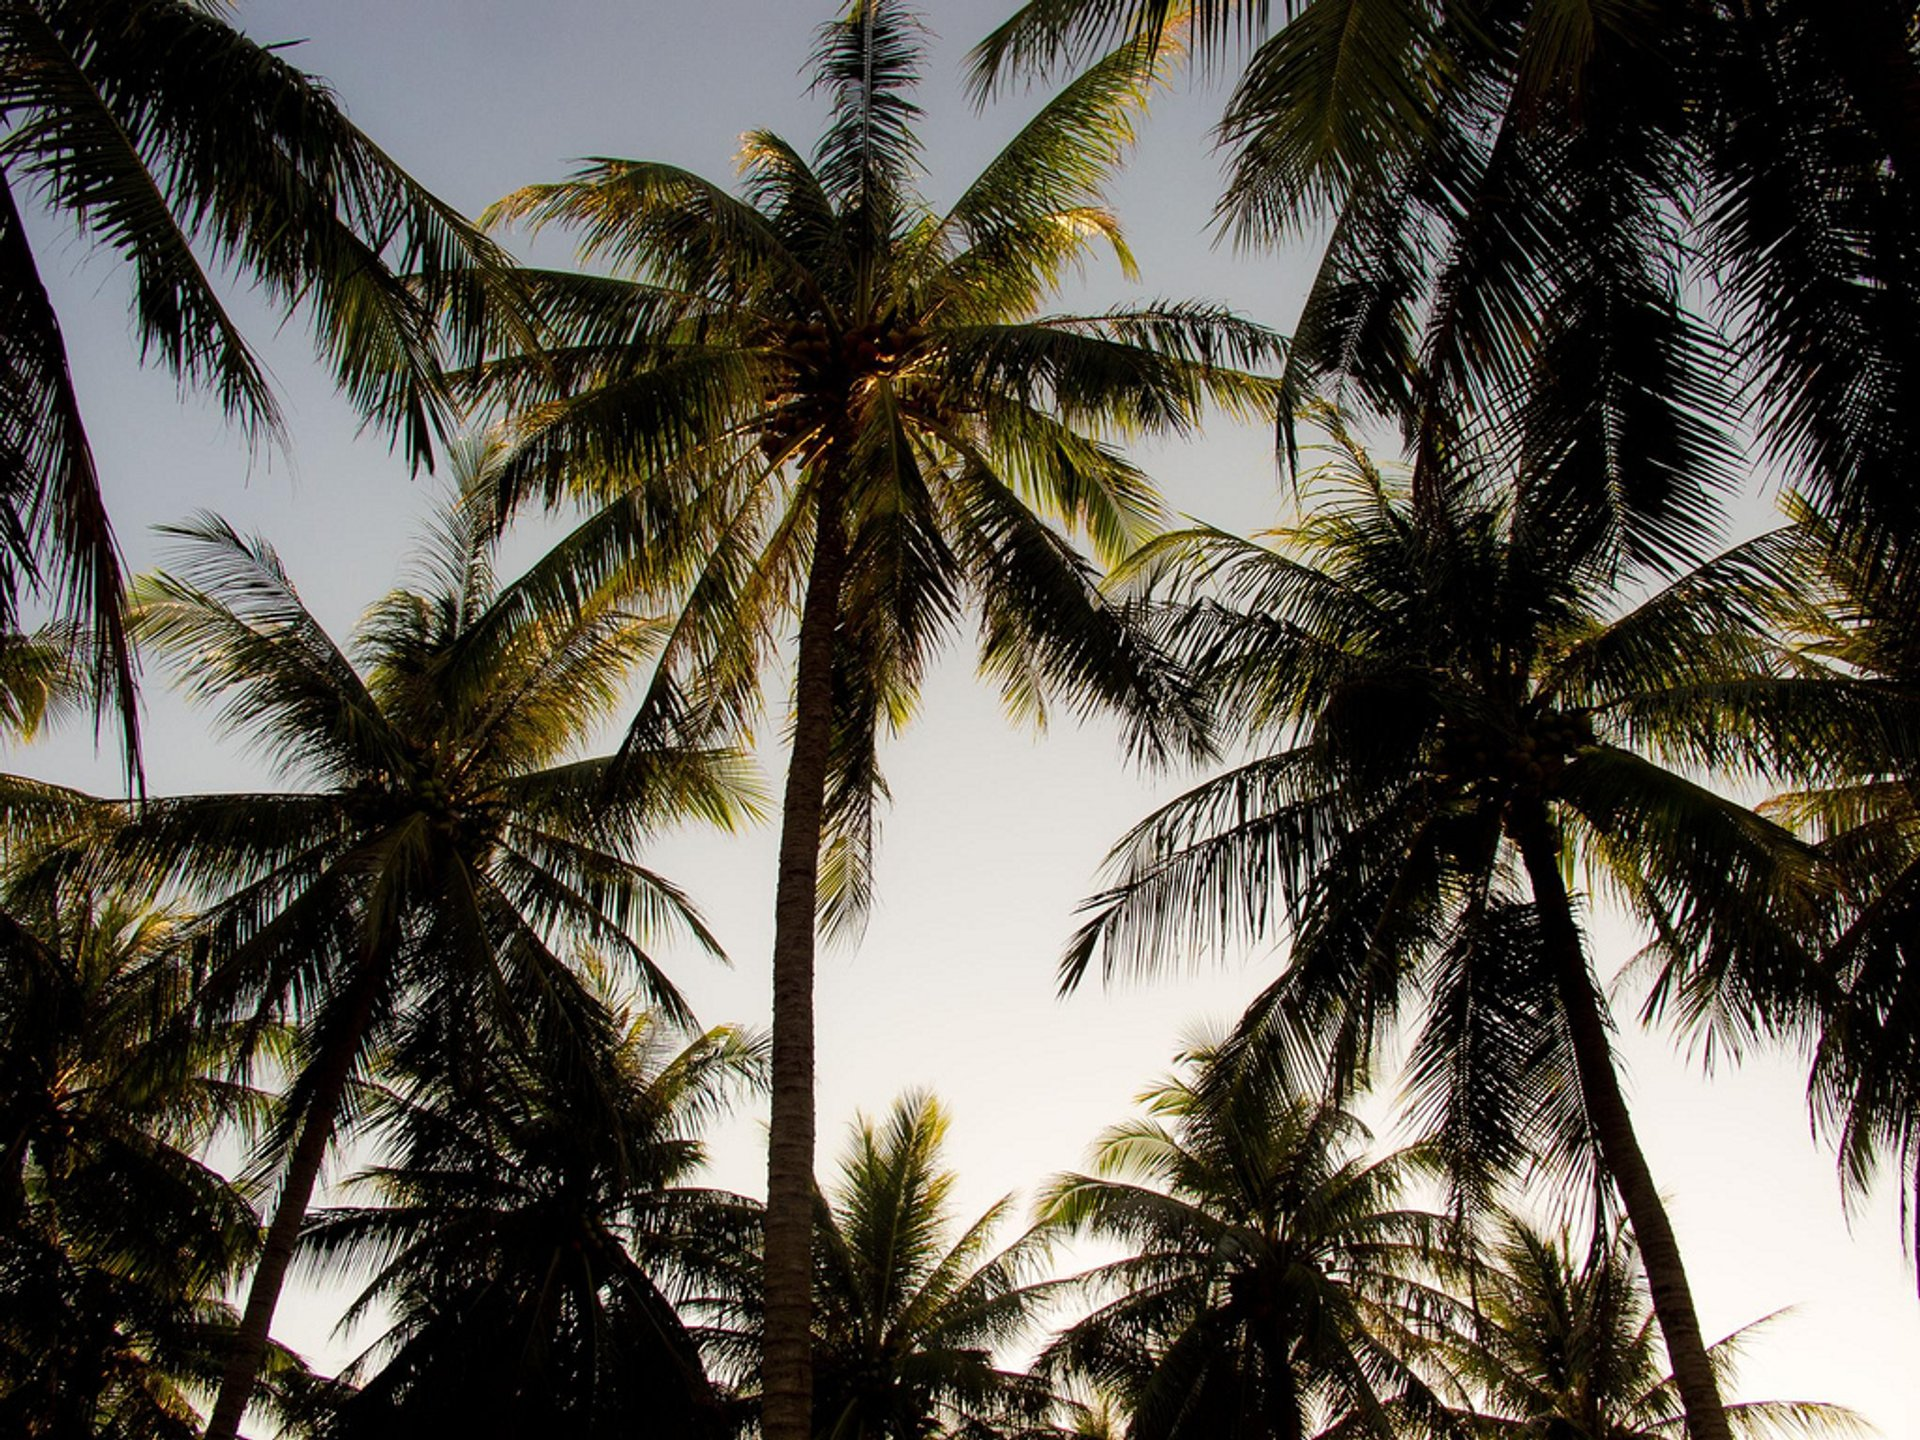 South Vietnam Dry Season in Vietnam 2020 - Best Time